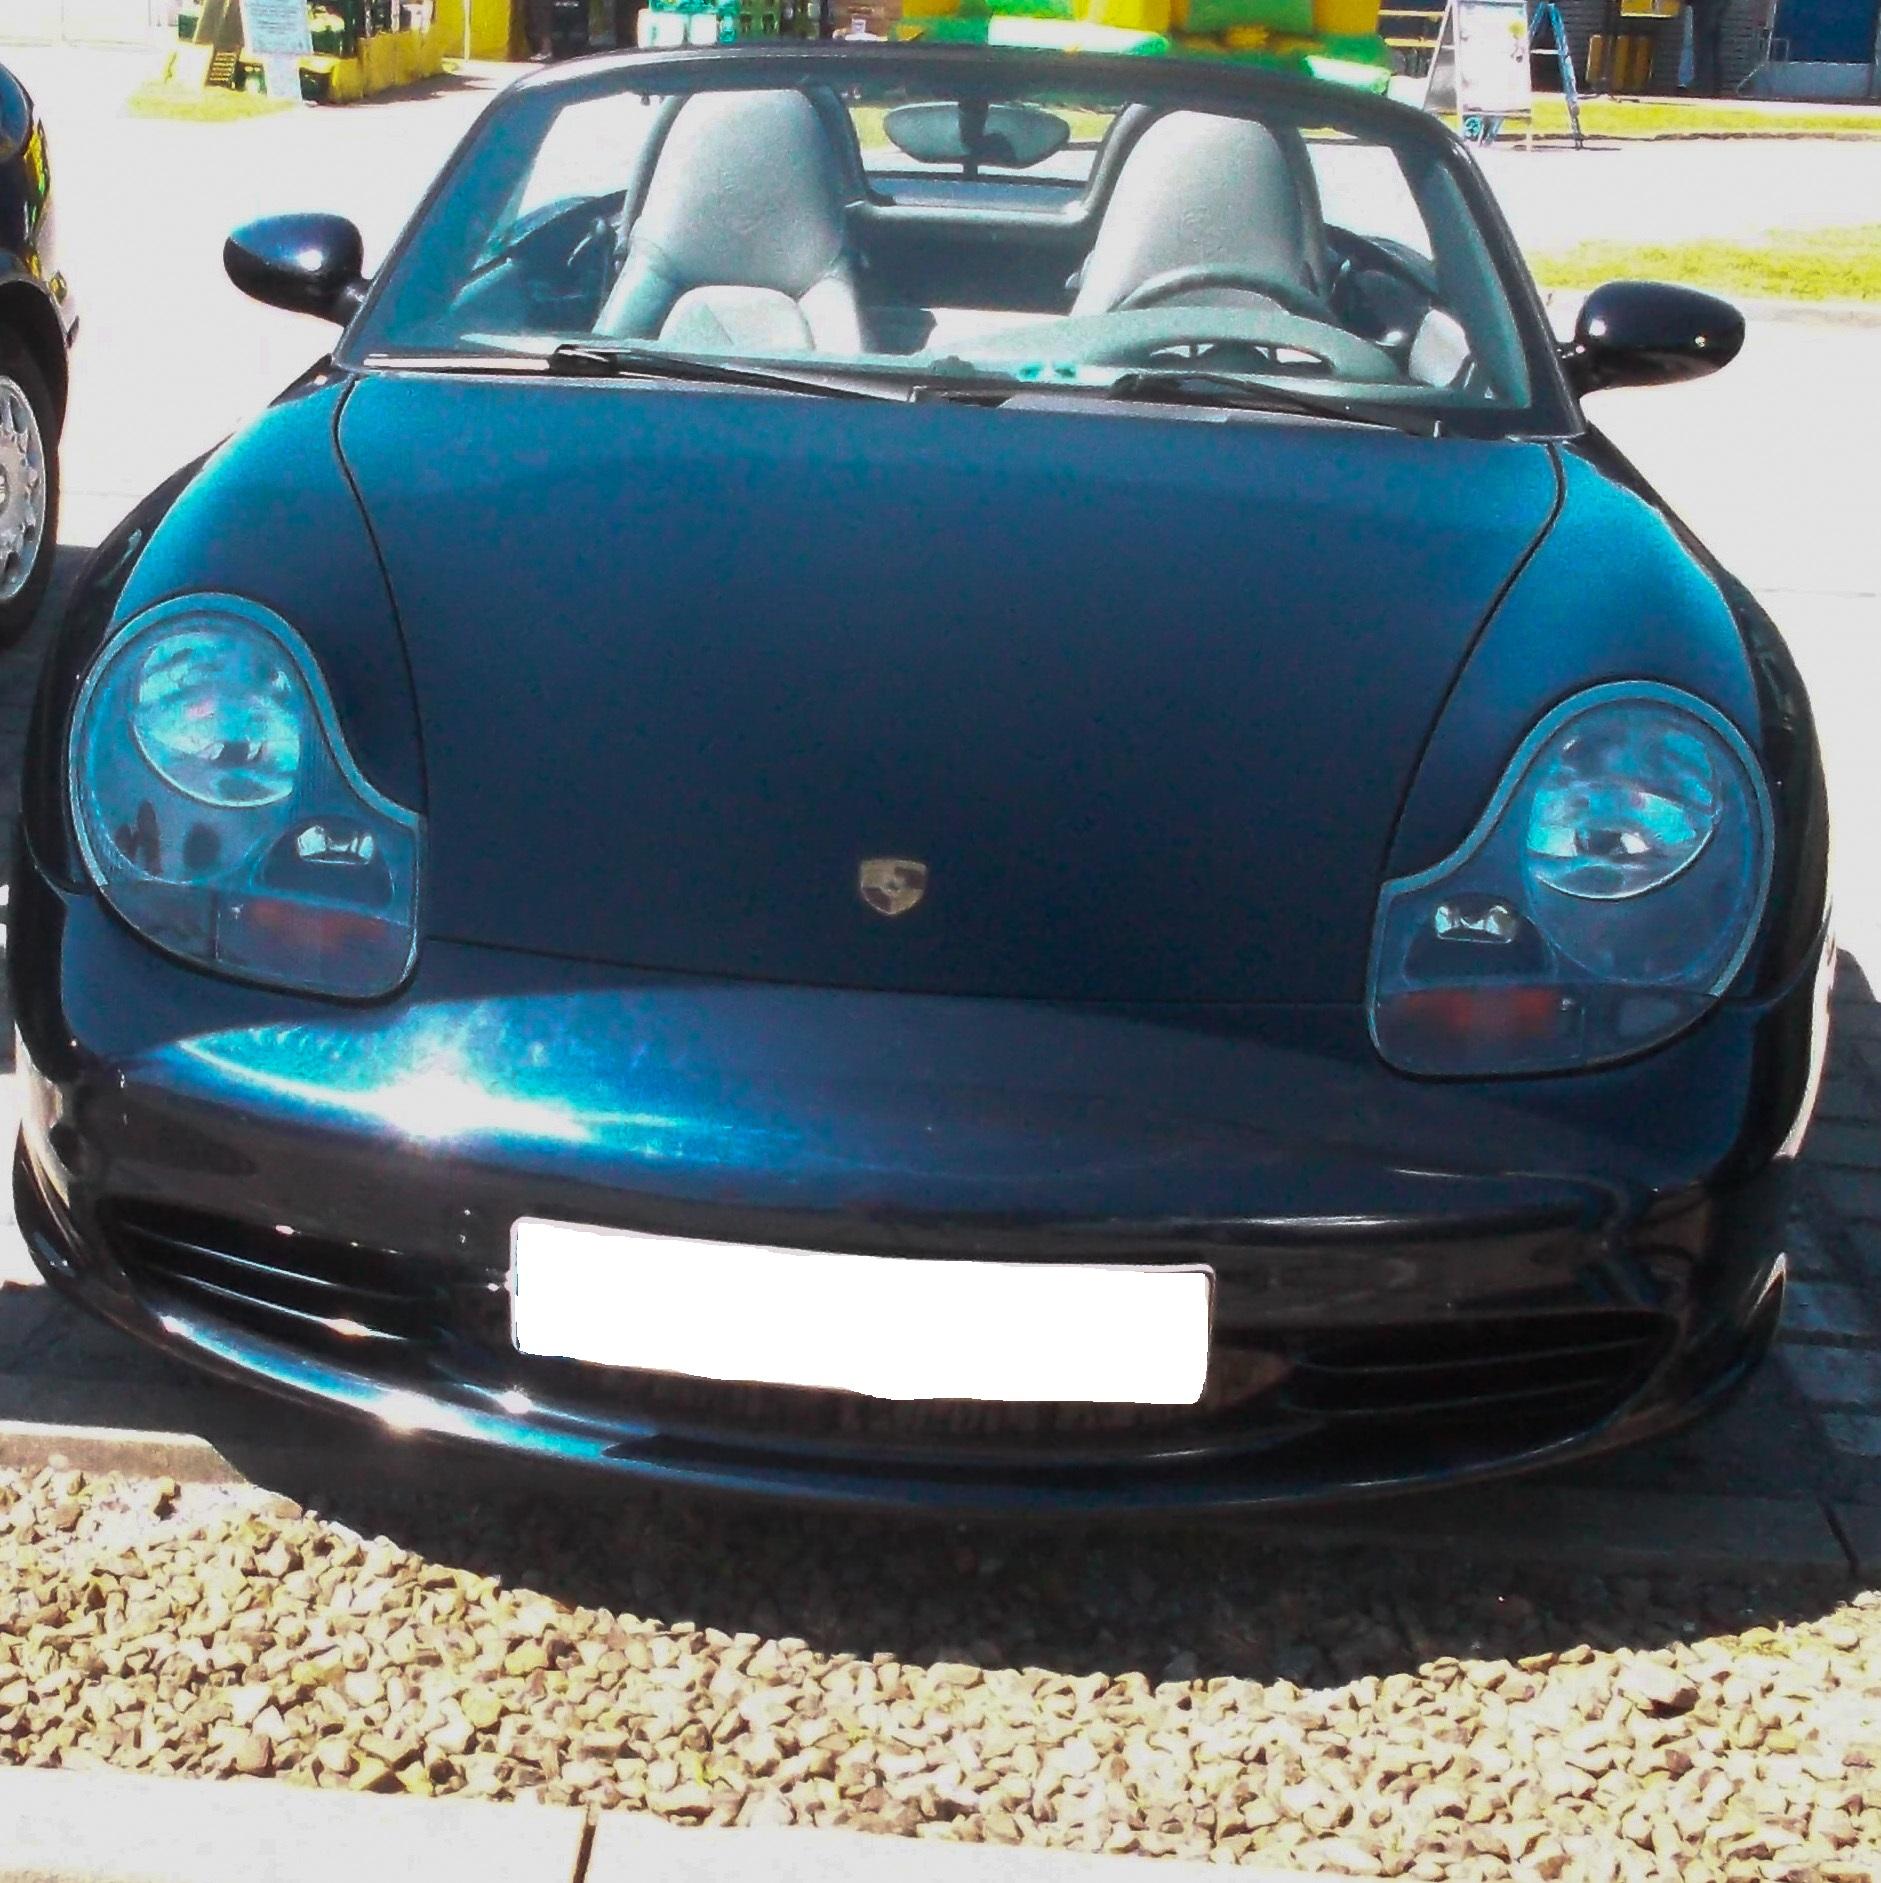 Porsche Boxster 986 Black: File:Black Porsche 986 Boxster Front (2).jpg